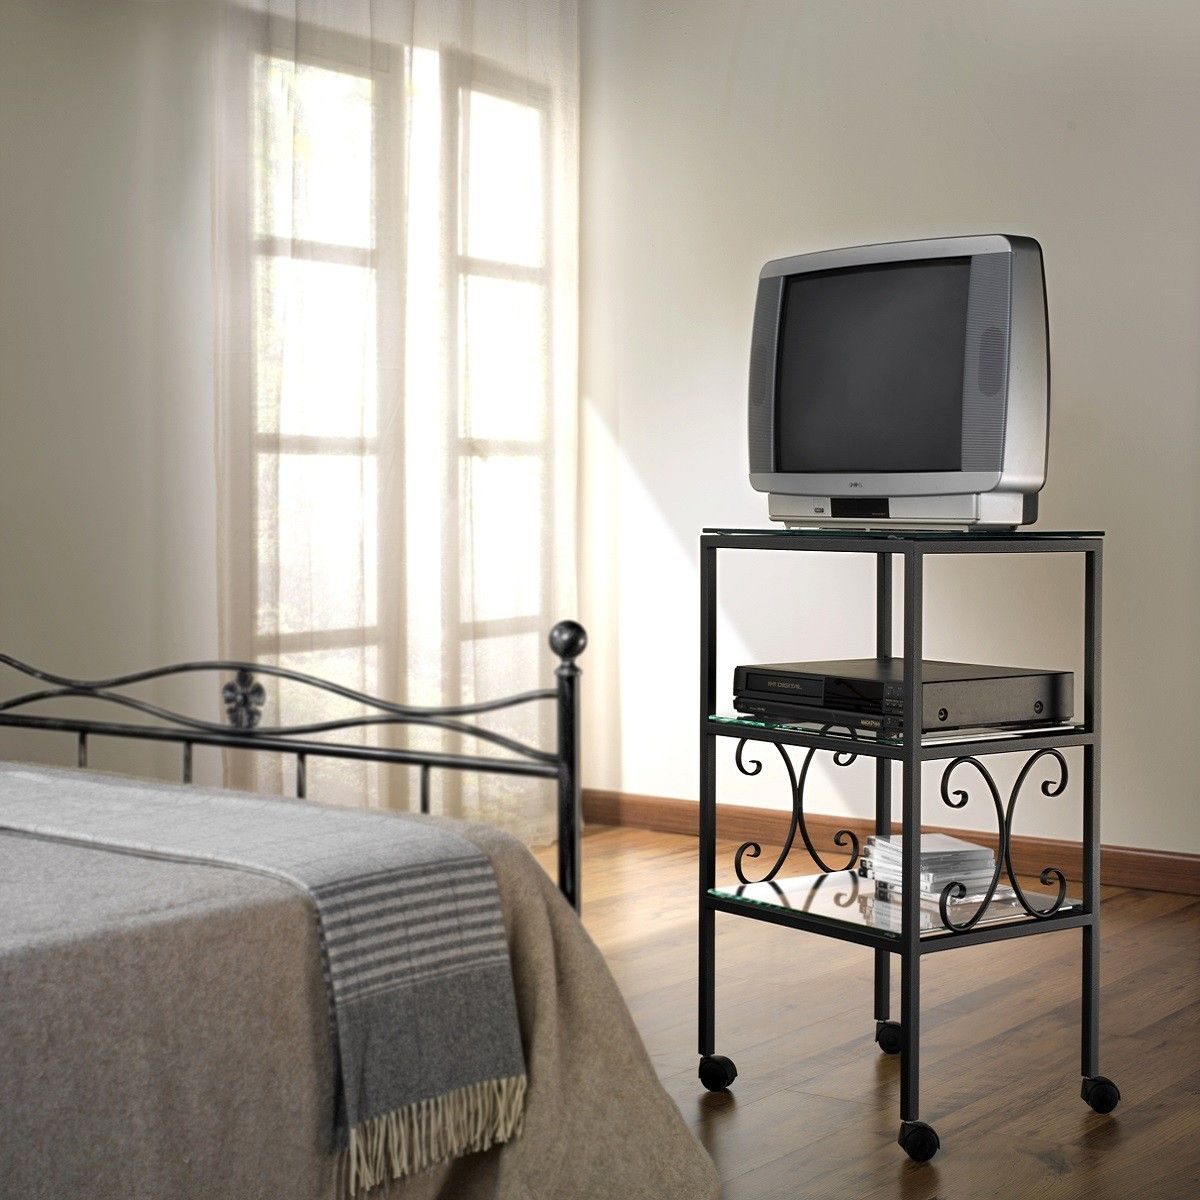 Tavolino Porta Tv.Tavolino Porta Tv Ritz Tavolini Classici Design Del